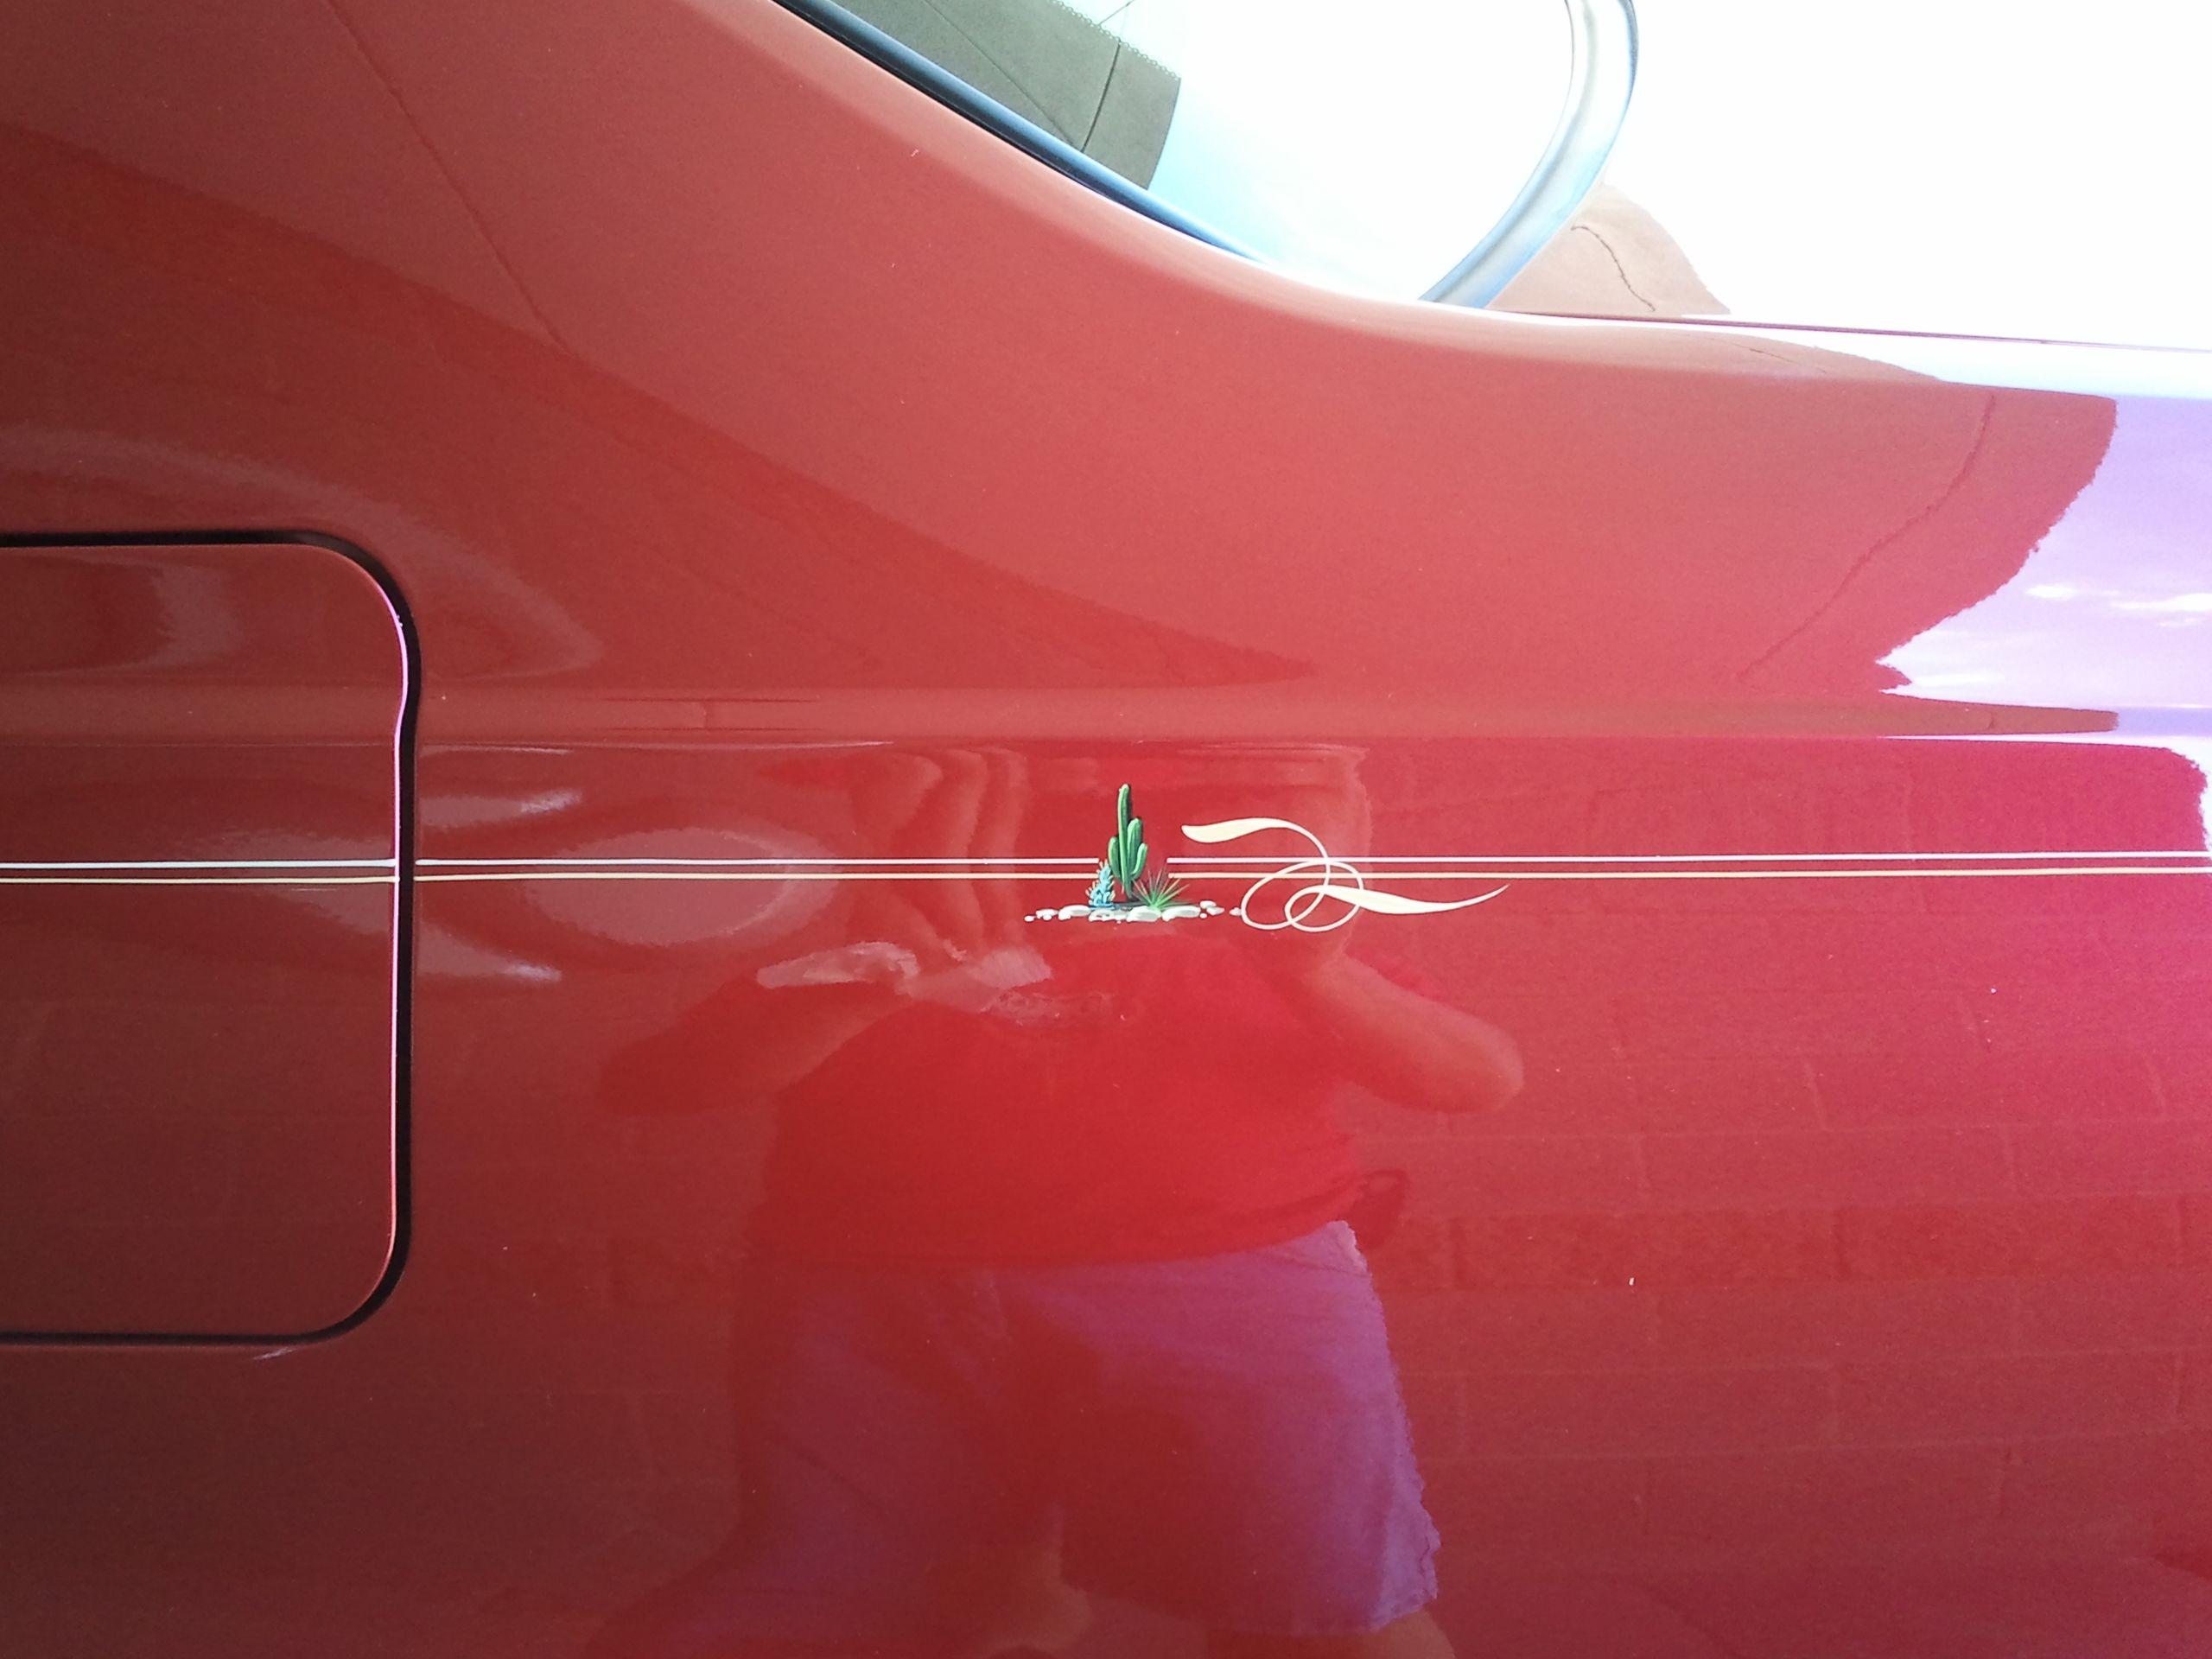 Classic cars authority cool pinstriping from the la roadster show - Pinstripes For Cars Phoenix Az Tony Perez Peoria Az Car Paint Goodyear